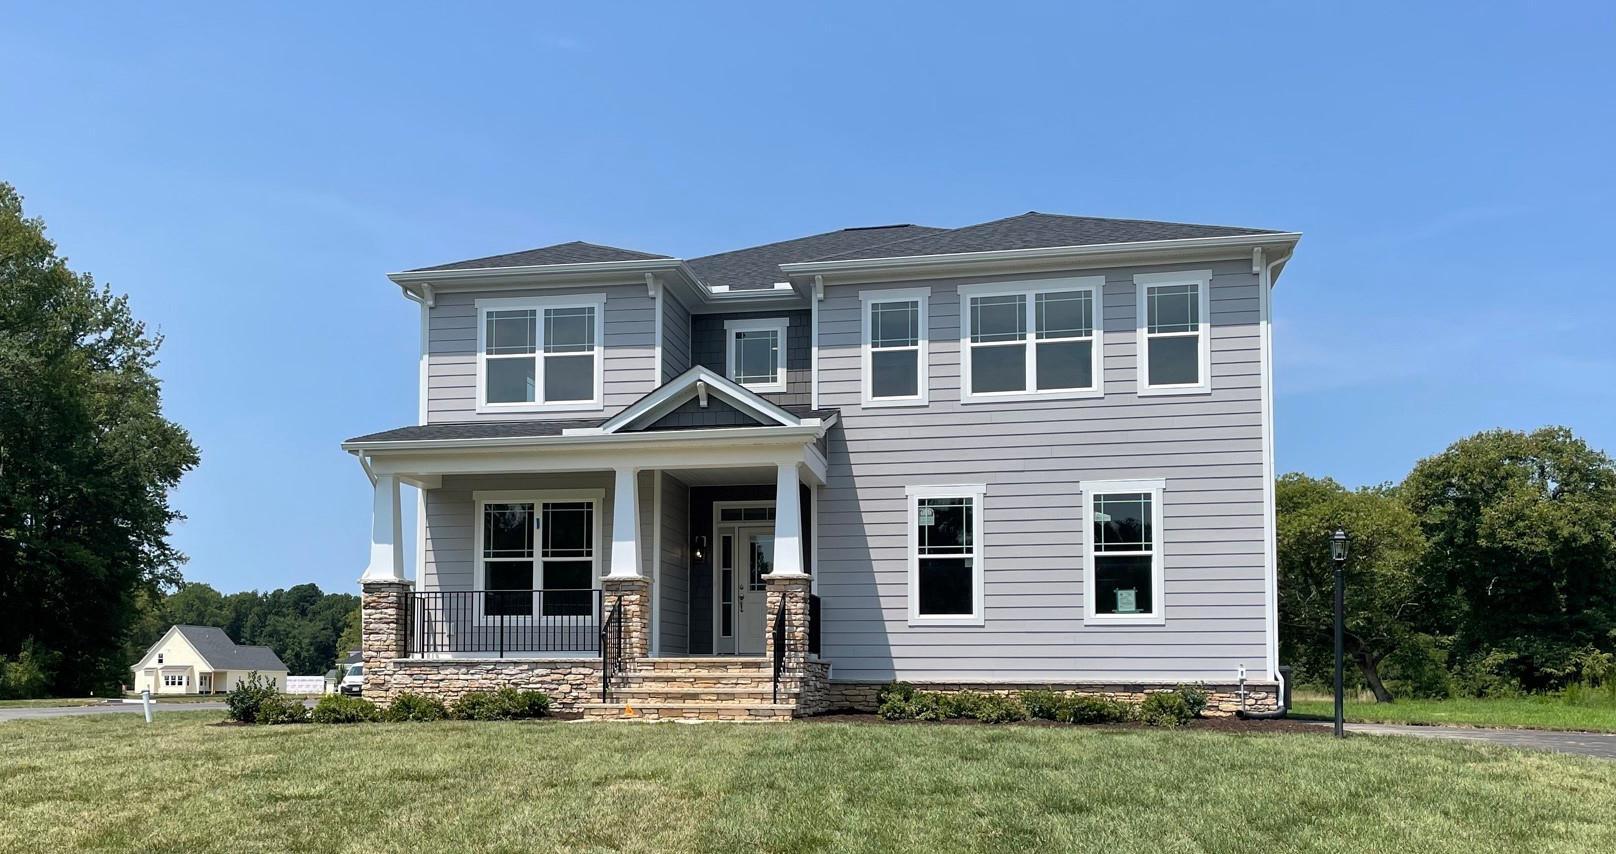 12105 Grandview Hill Court, Ashland, VA 23005 Home for Sale